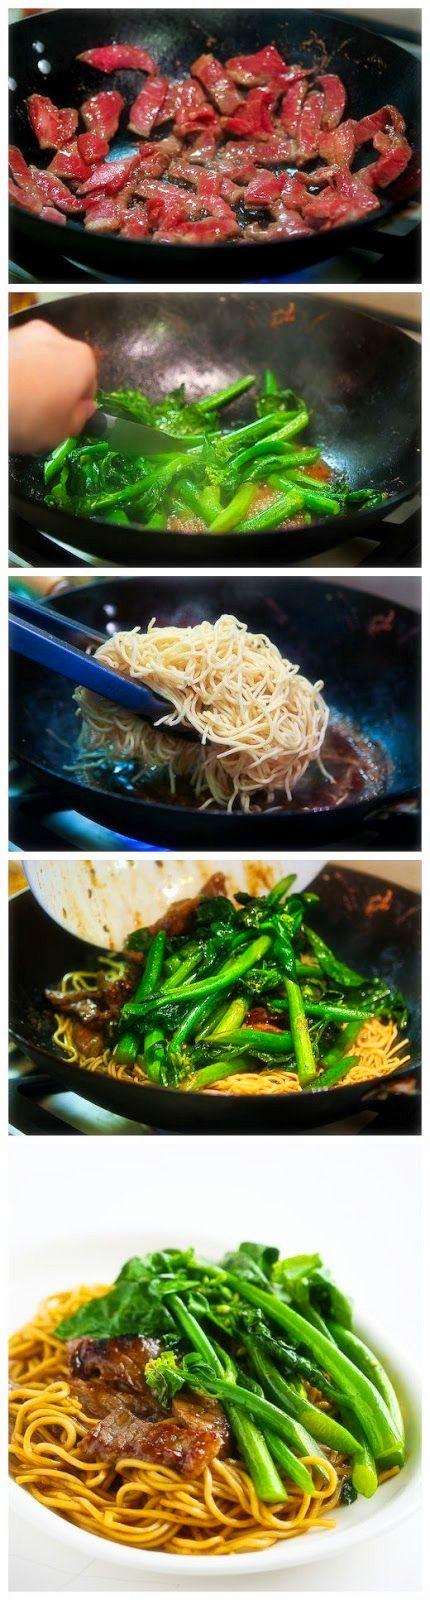 Broccoli Beef Noodle Stir Fry - Joybx